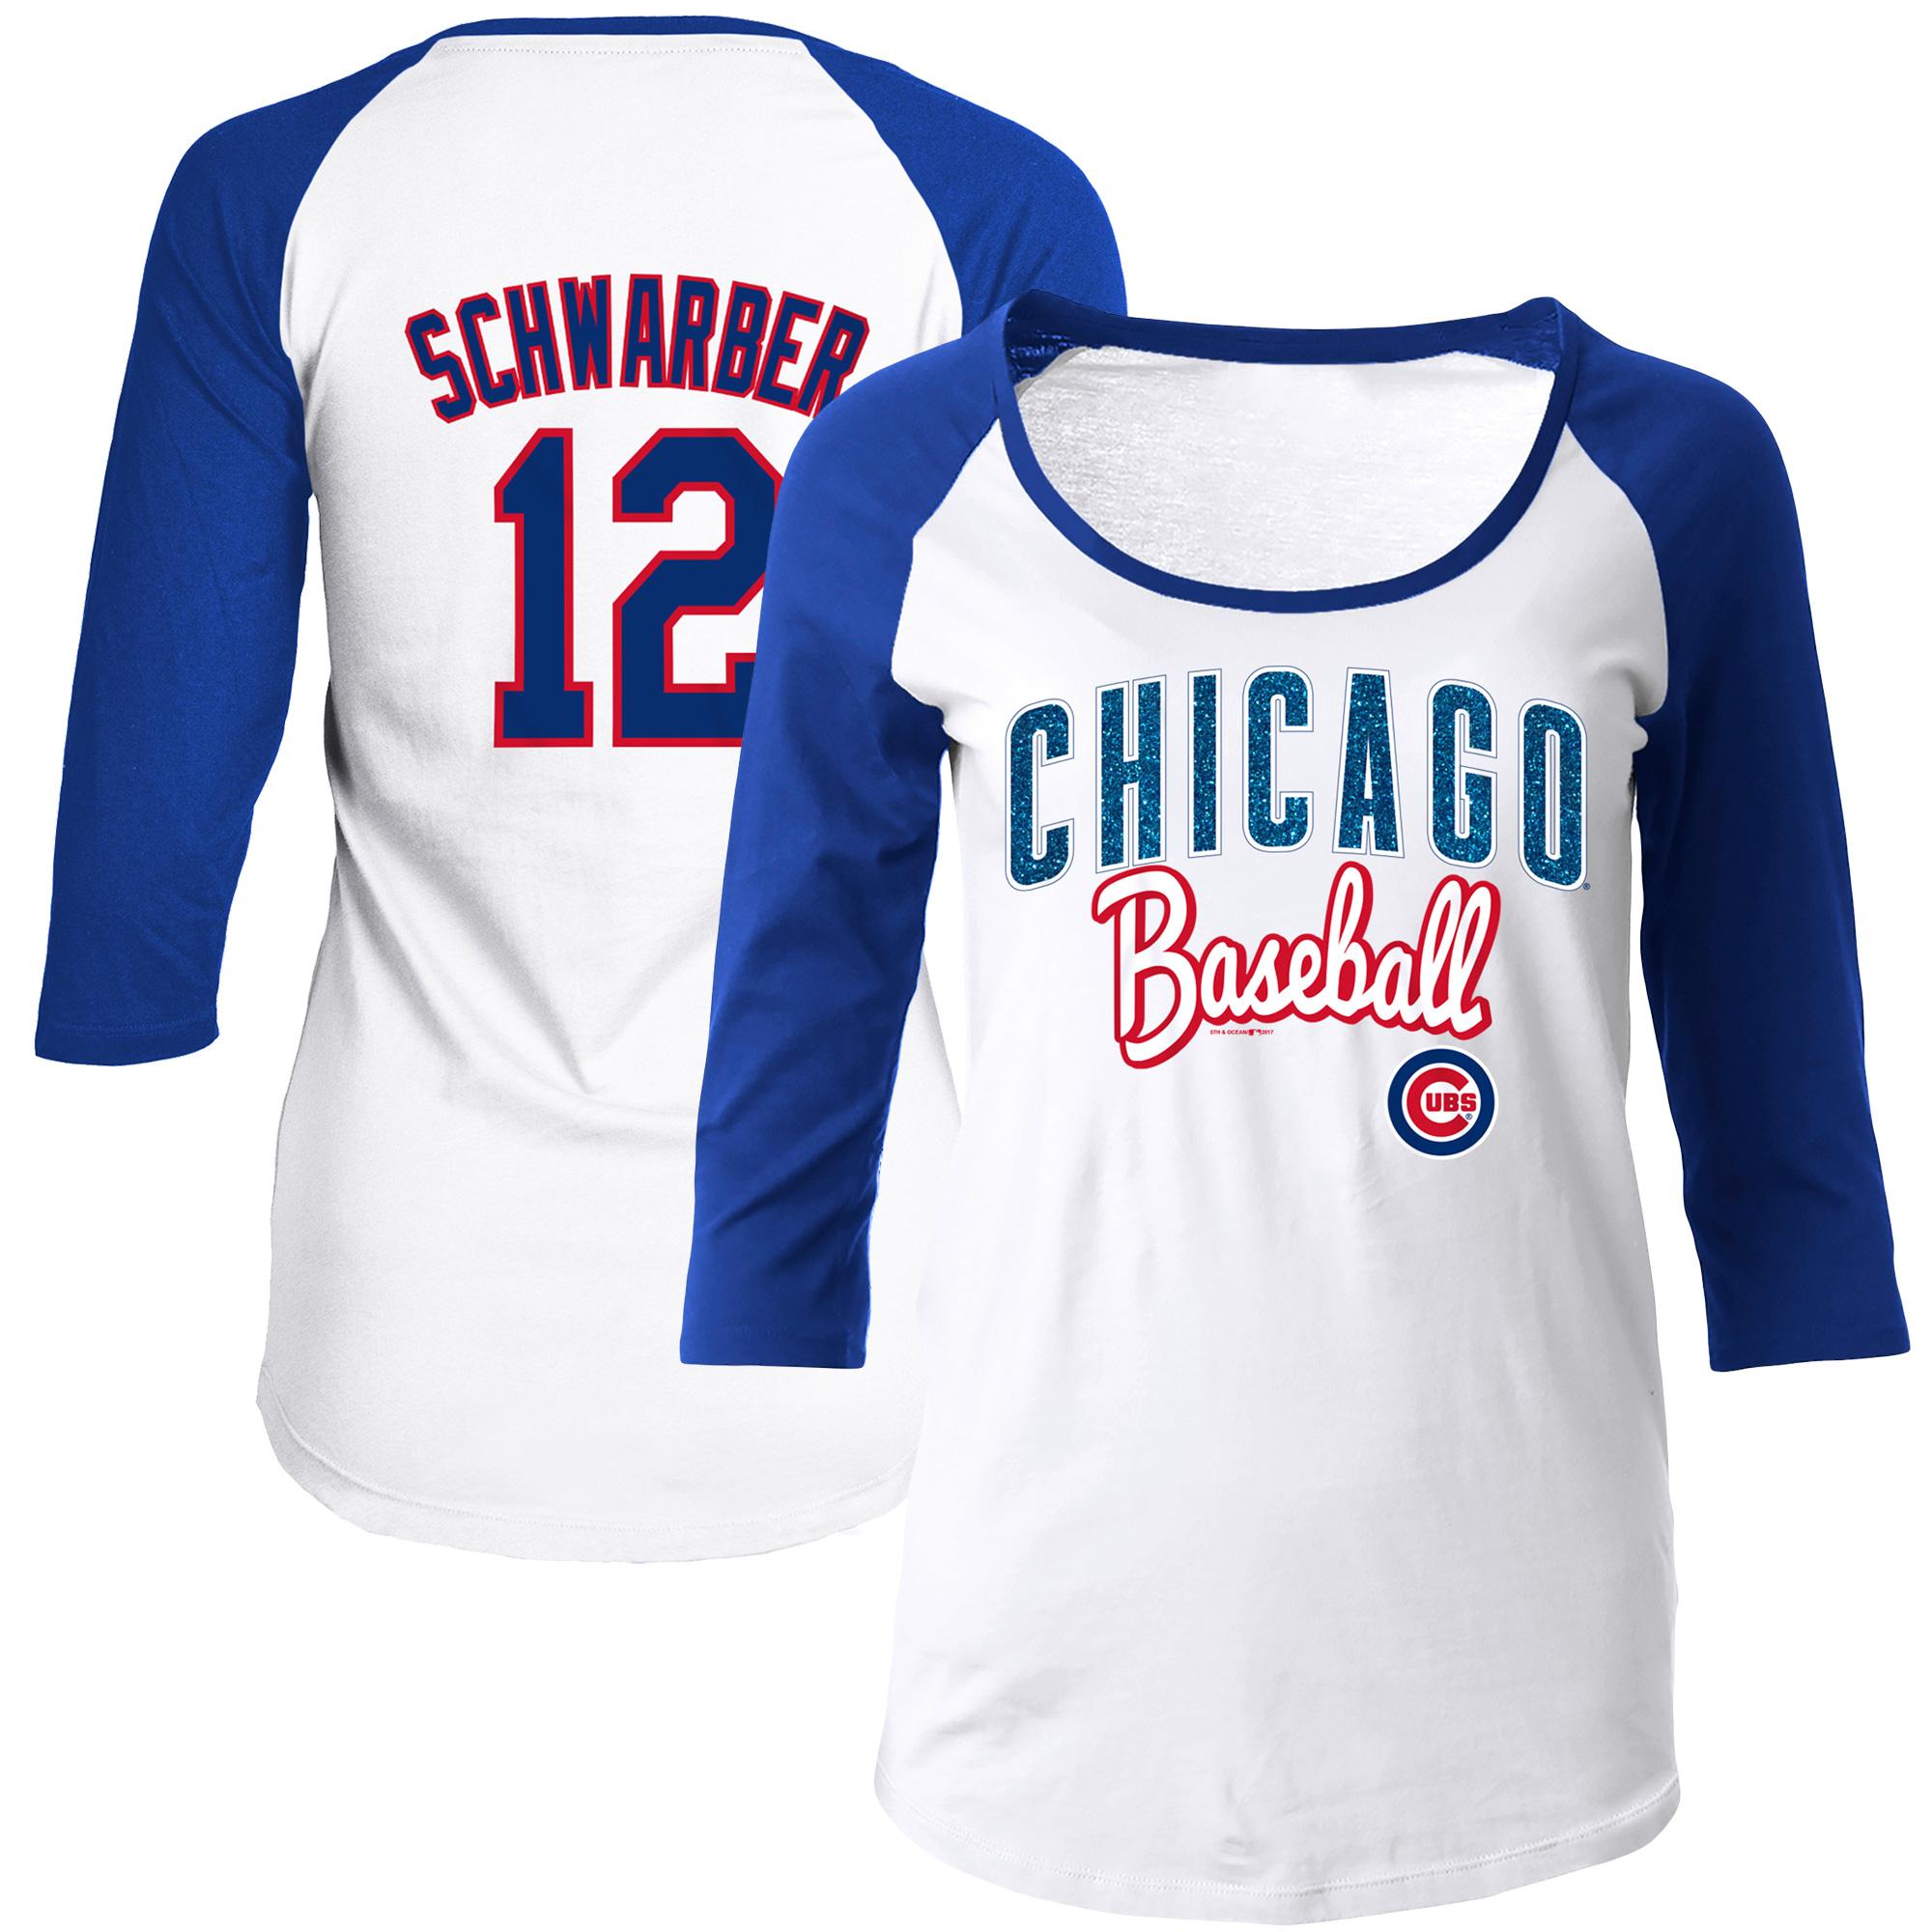 Women's 5th & Ocean by New Era Kyle Schwarber White/Royal Chicago Cubs Glitter 3/4-Sleeve Raglan T-Shirt